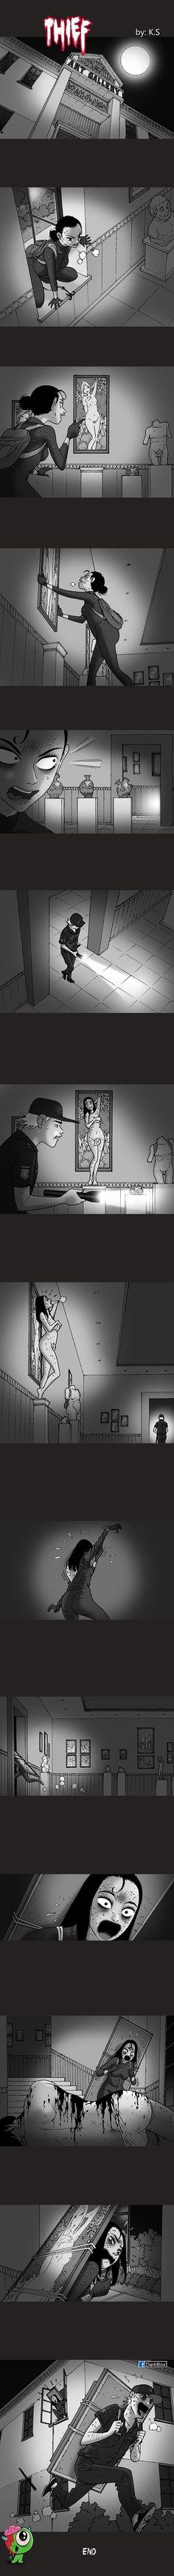 Silent Horror Silent Horror Comics, Scary Comics, Creepy Stories, Horror Stories, Jeepers Creepers, Lesbian Love, Pin Up Art, Manga Drawing, Horror Art